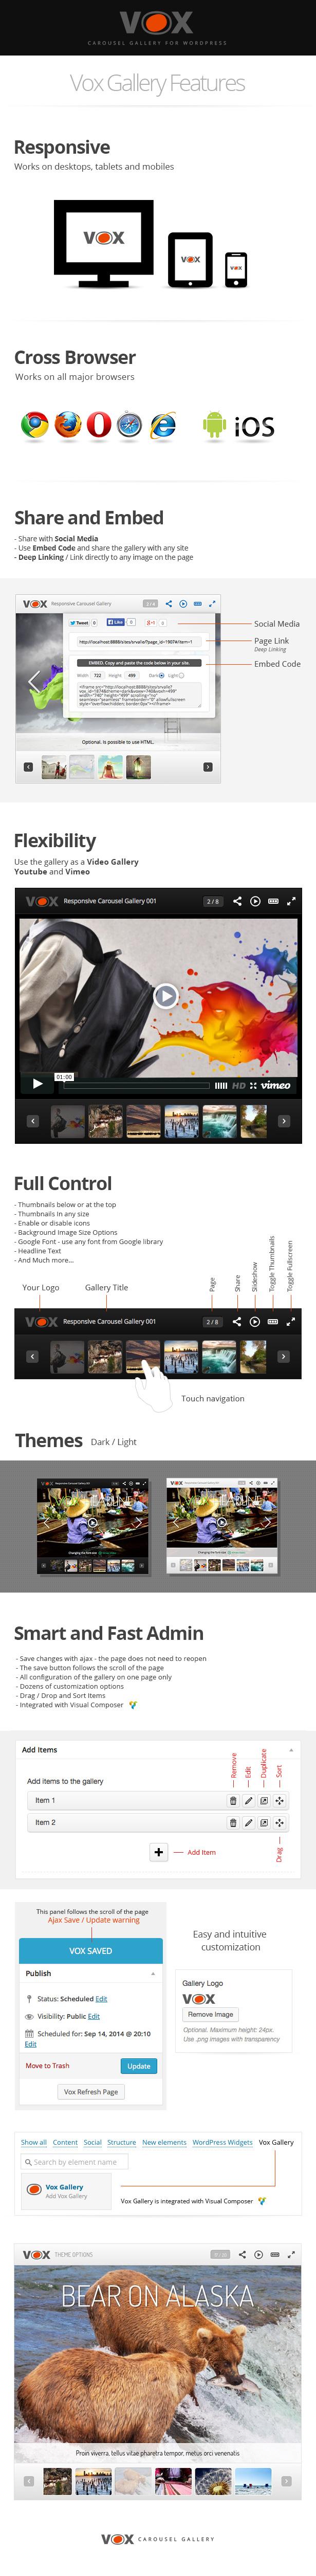 Vox Carousel Gallery for WordPress - 1